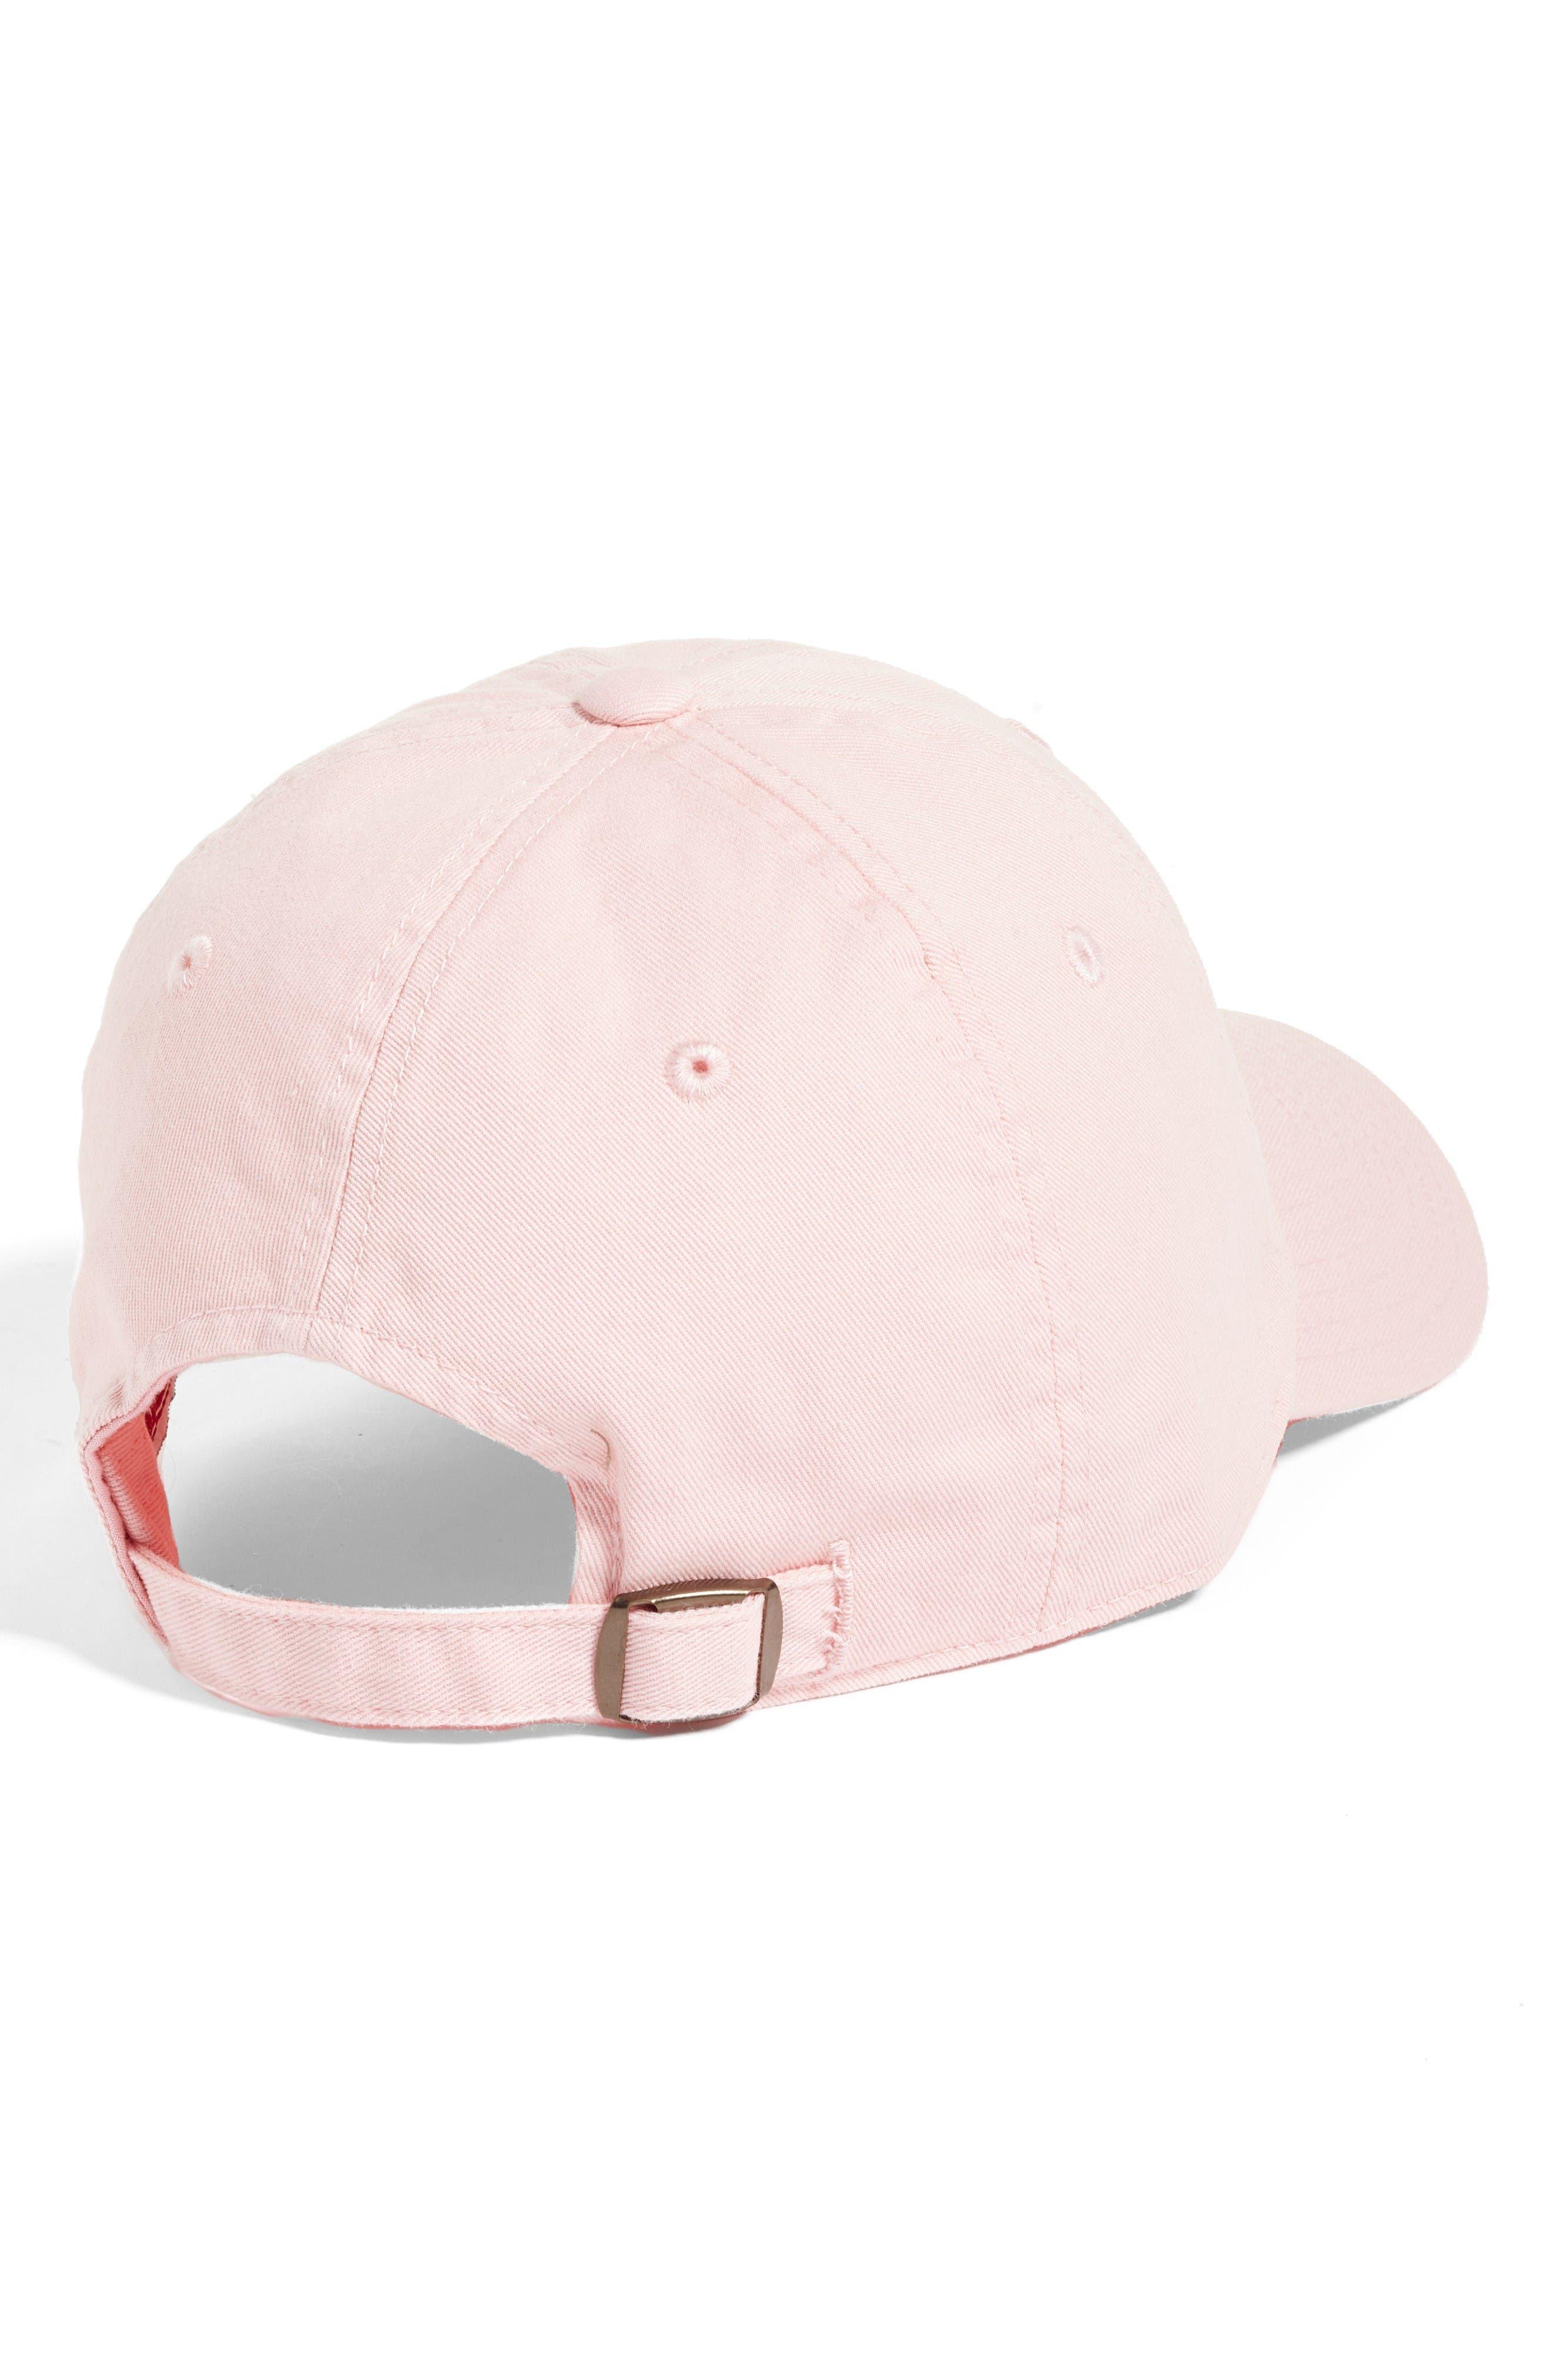 Cali Baseball Cap,                             Alternate thumbnail 3, color,                             Club Pink